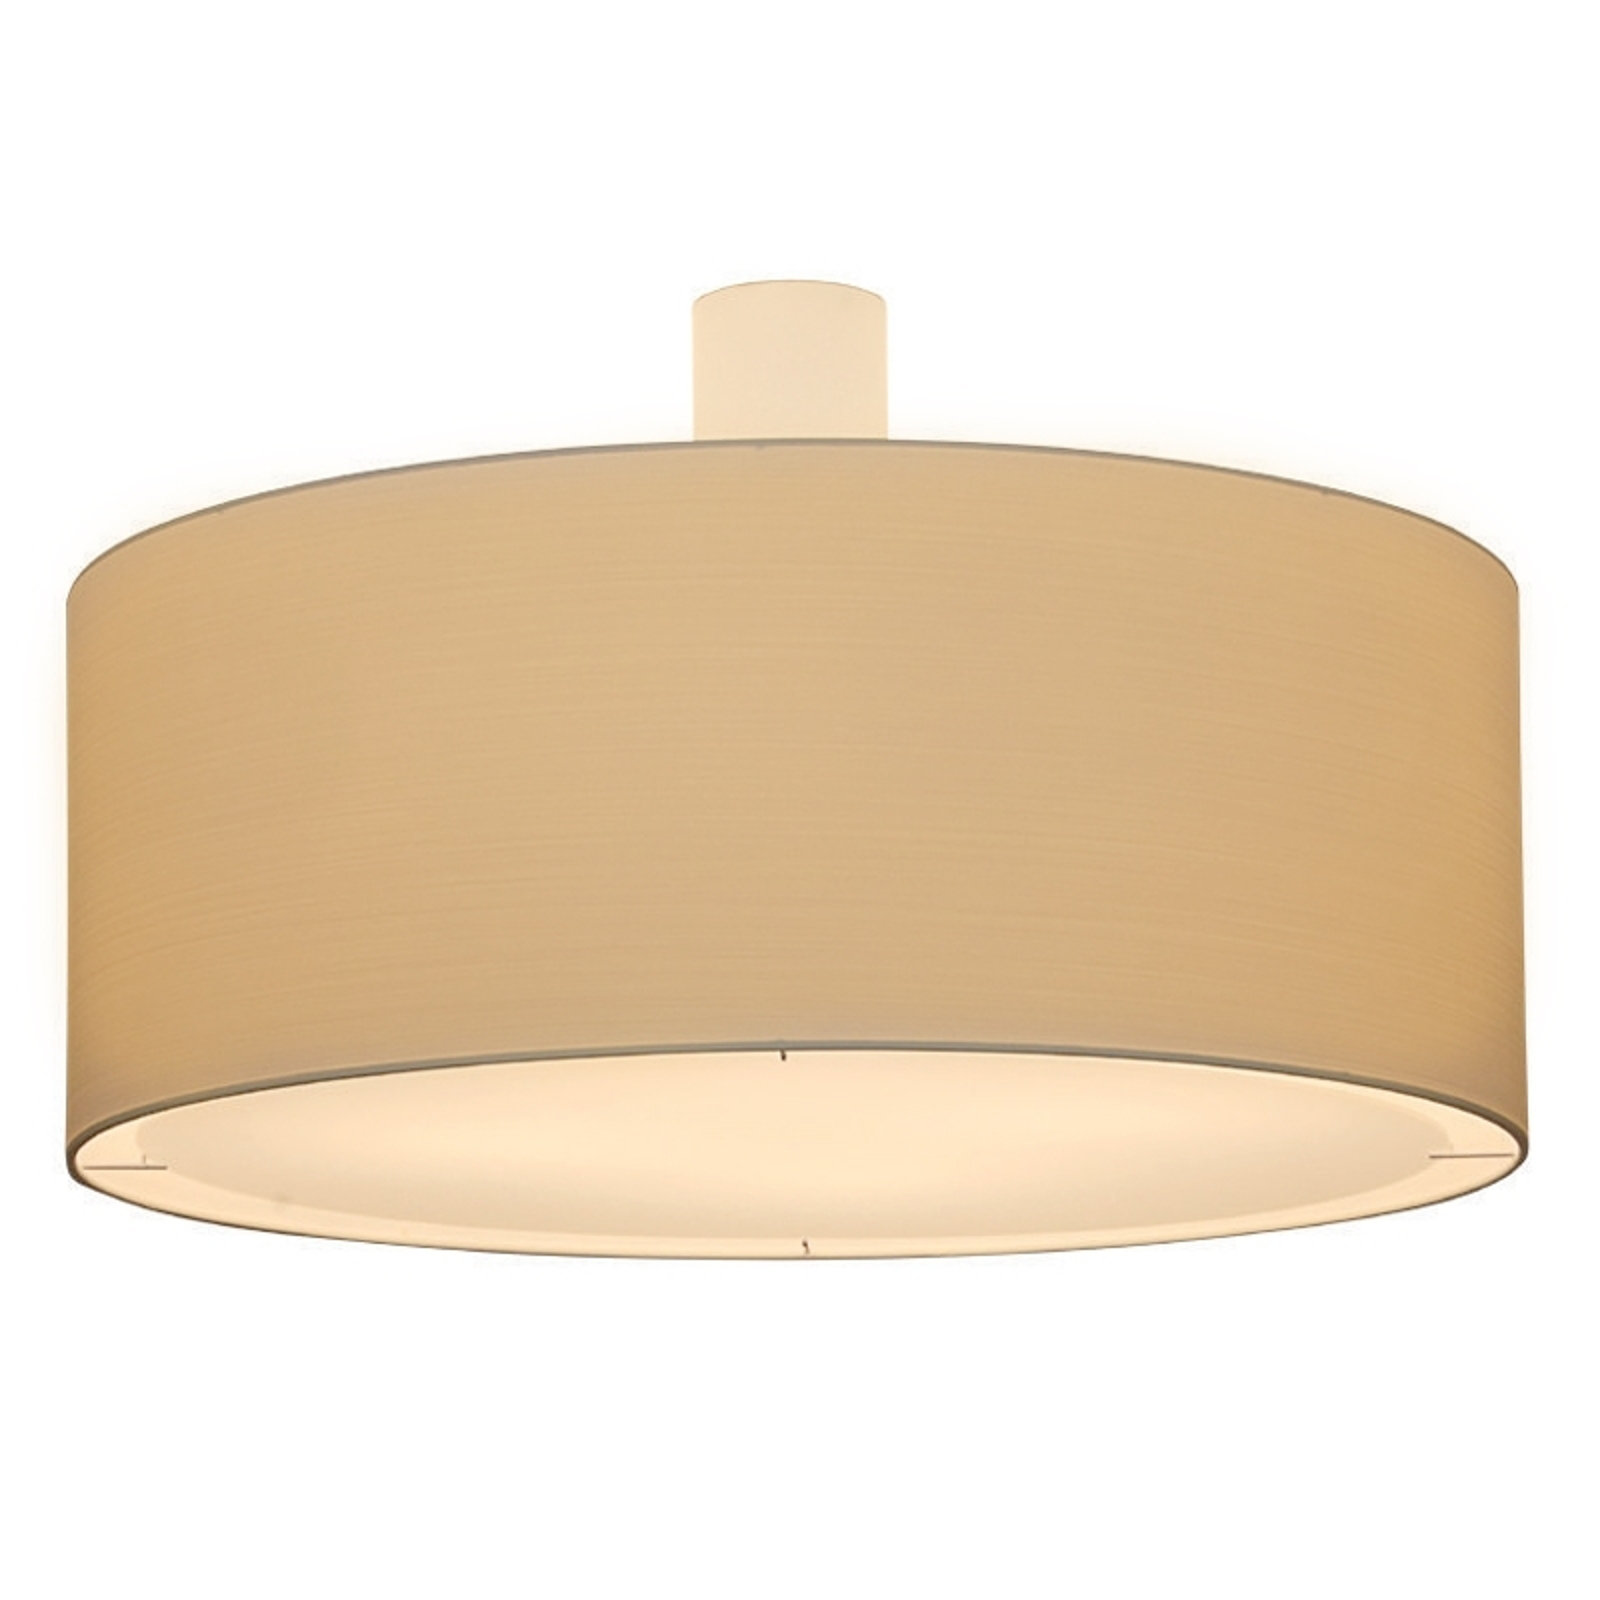 Kremowa lampa sufitowa LIVING ELEGANT śred. 100 cm